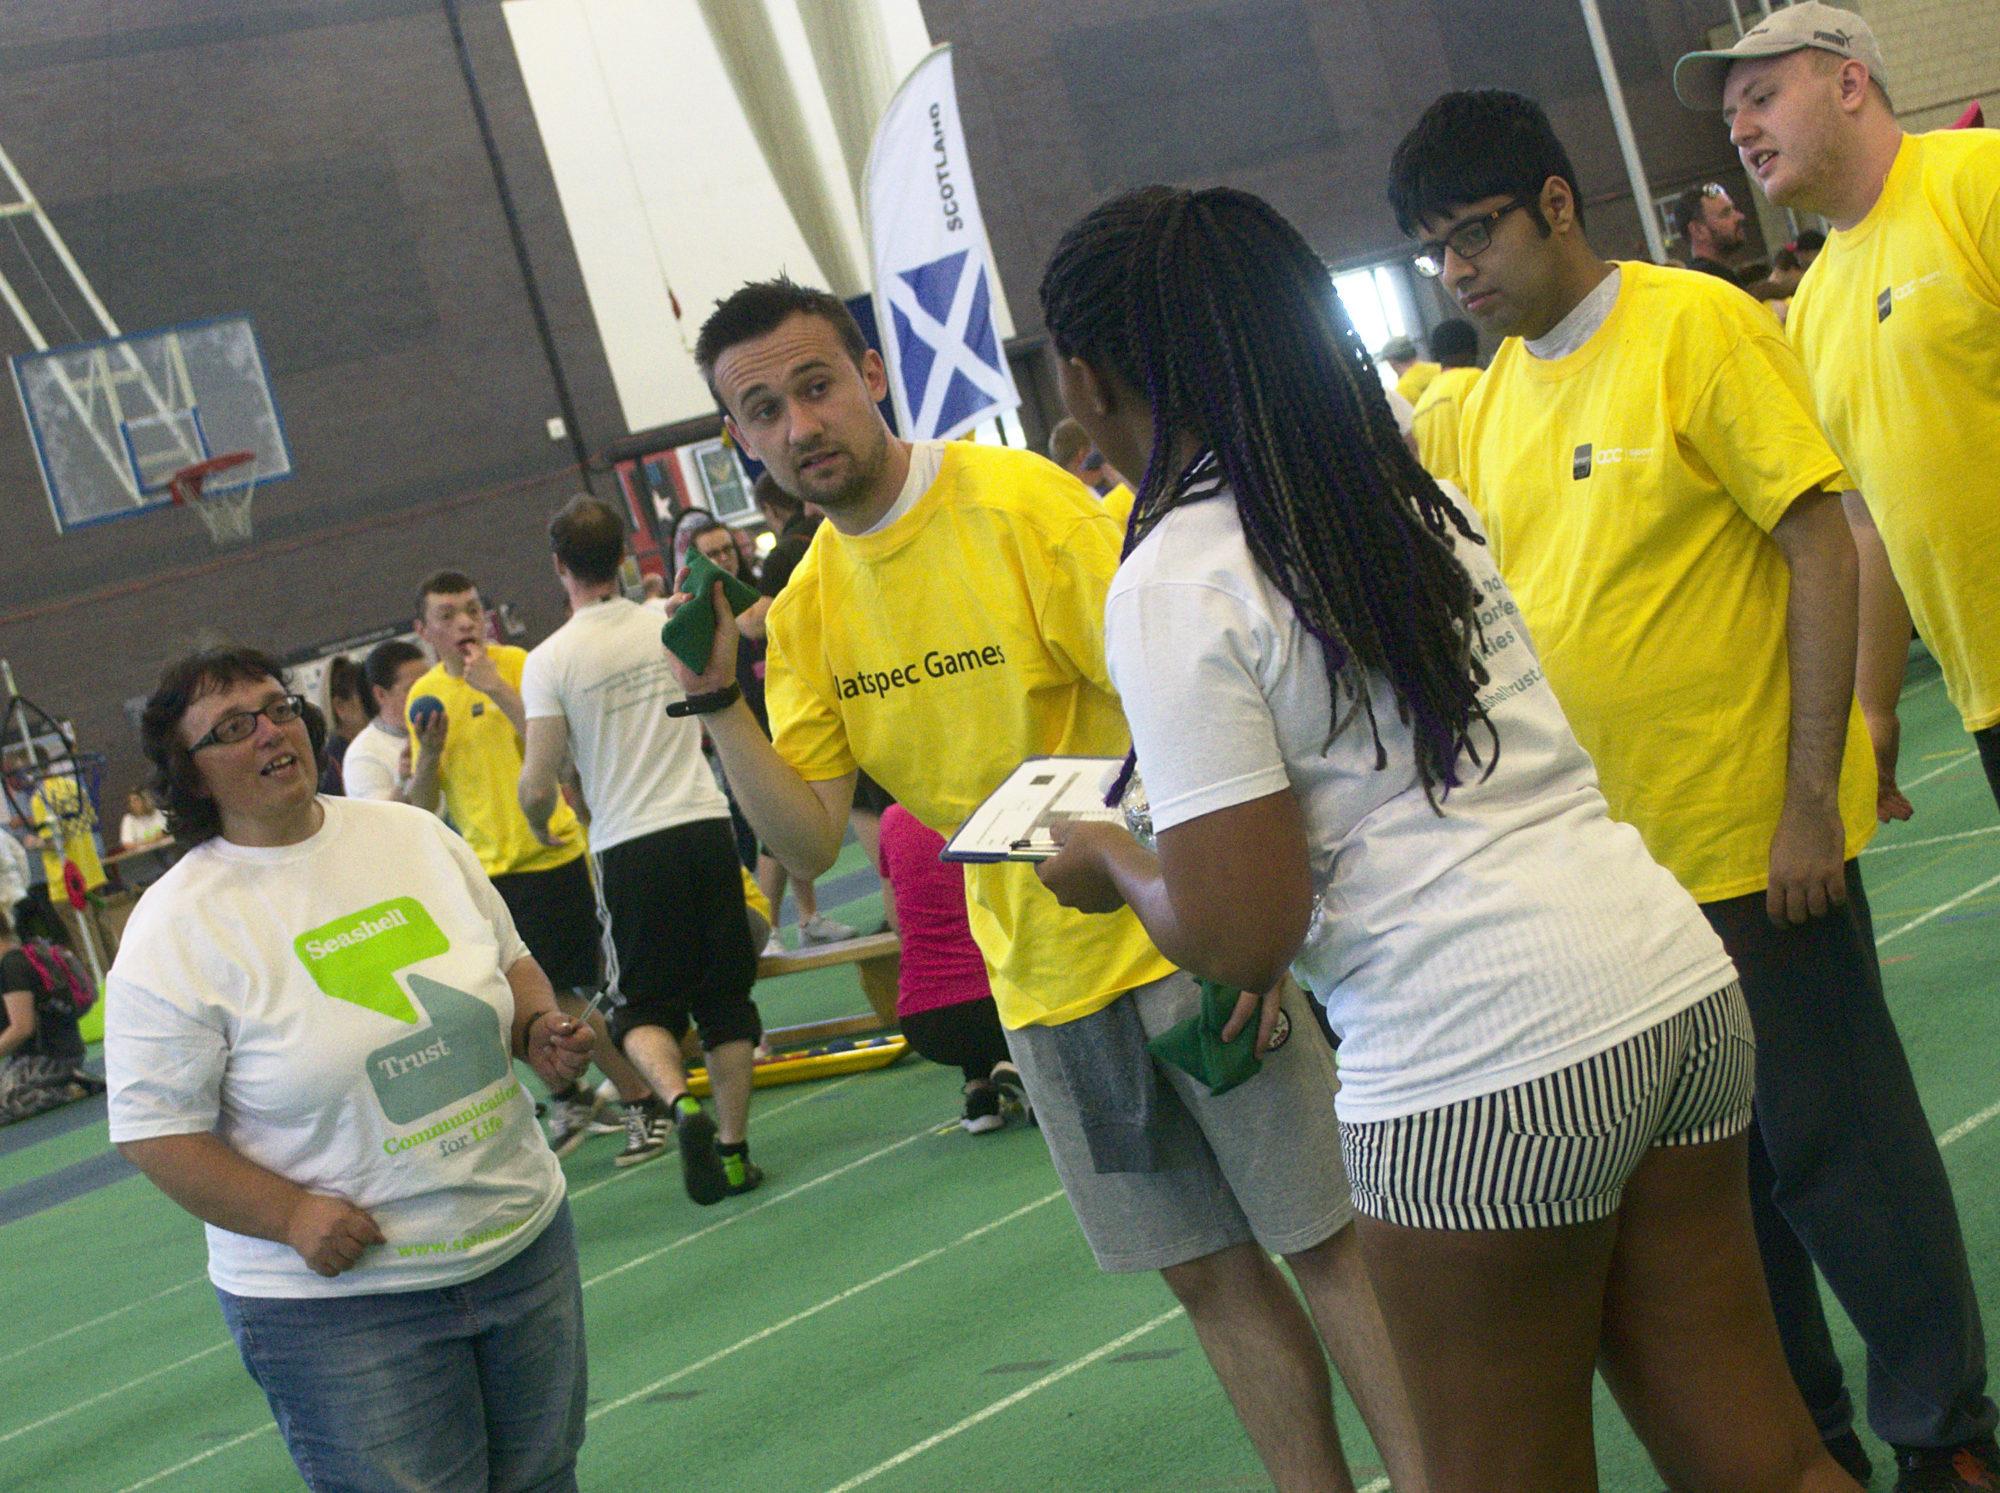 Volunteers advising a student